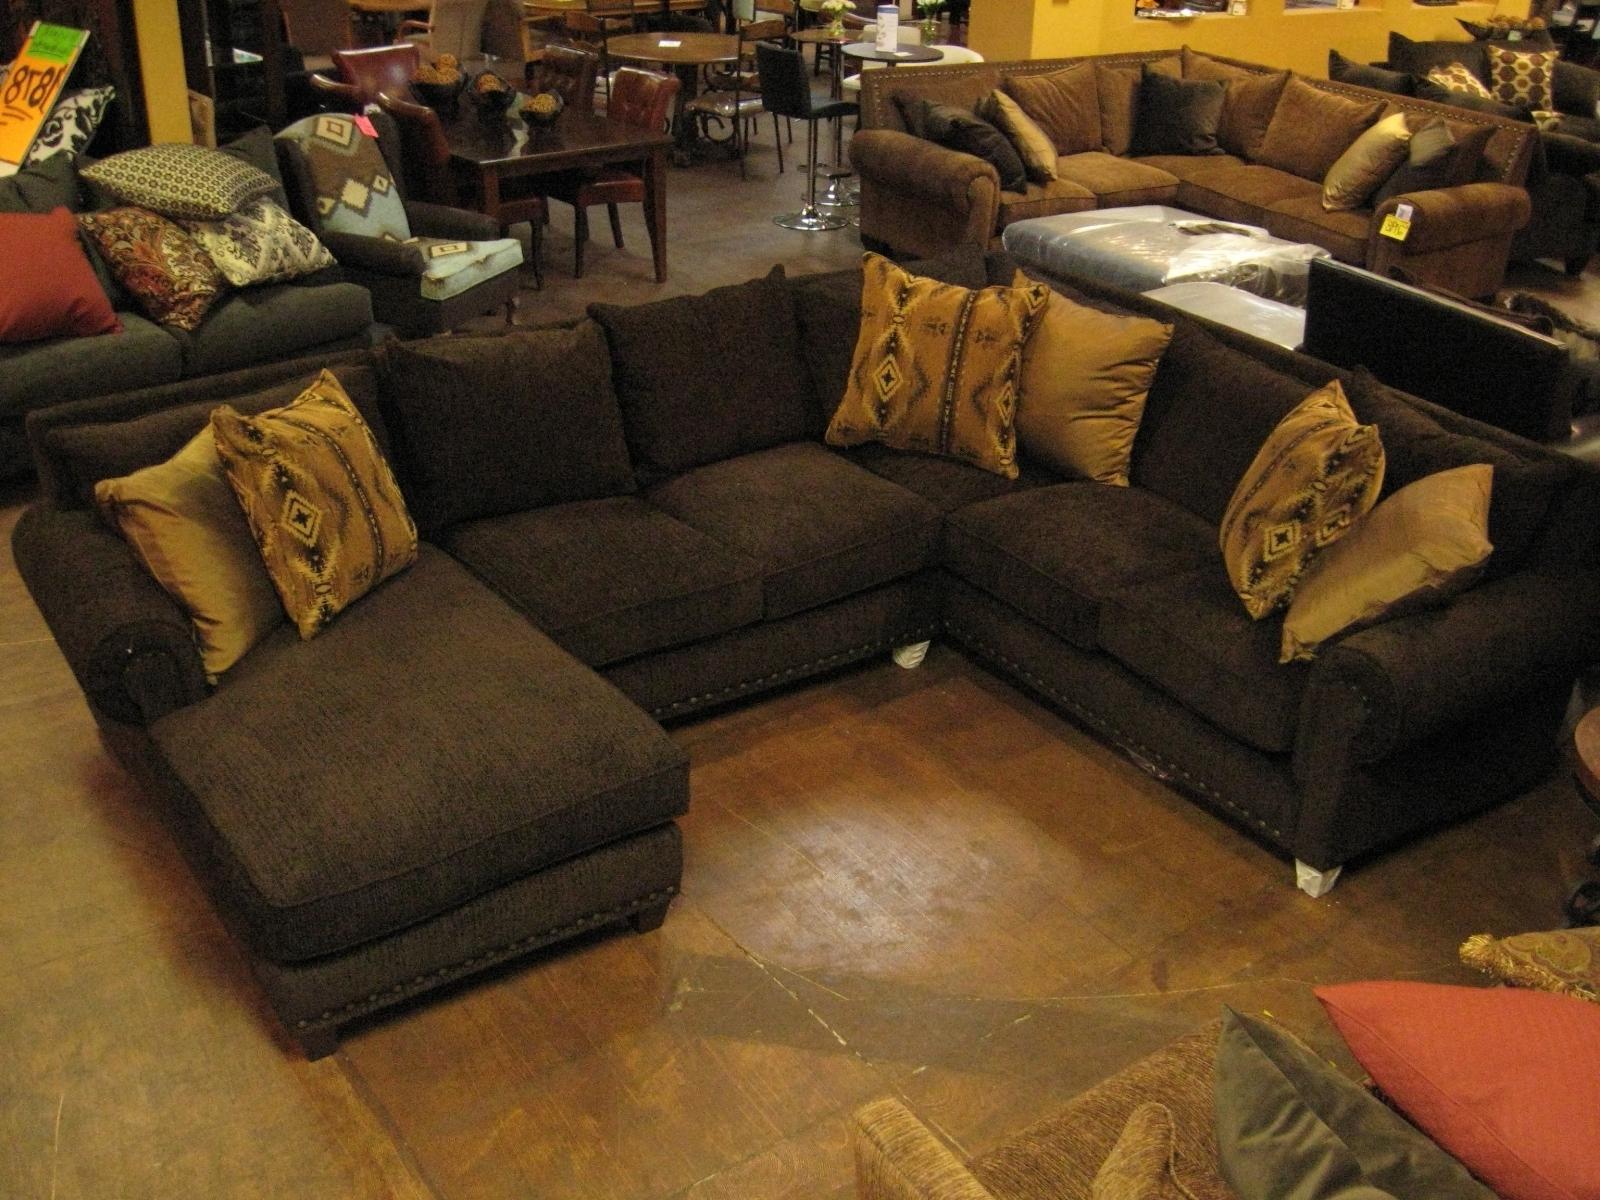 The Best Deep Cushion Sofas